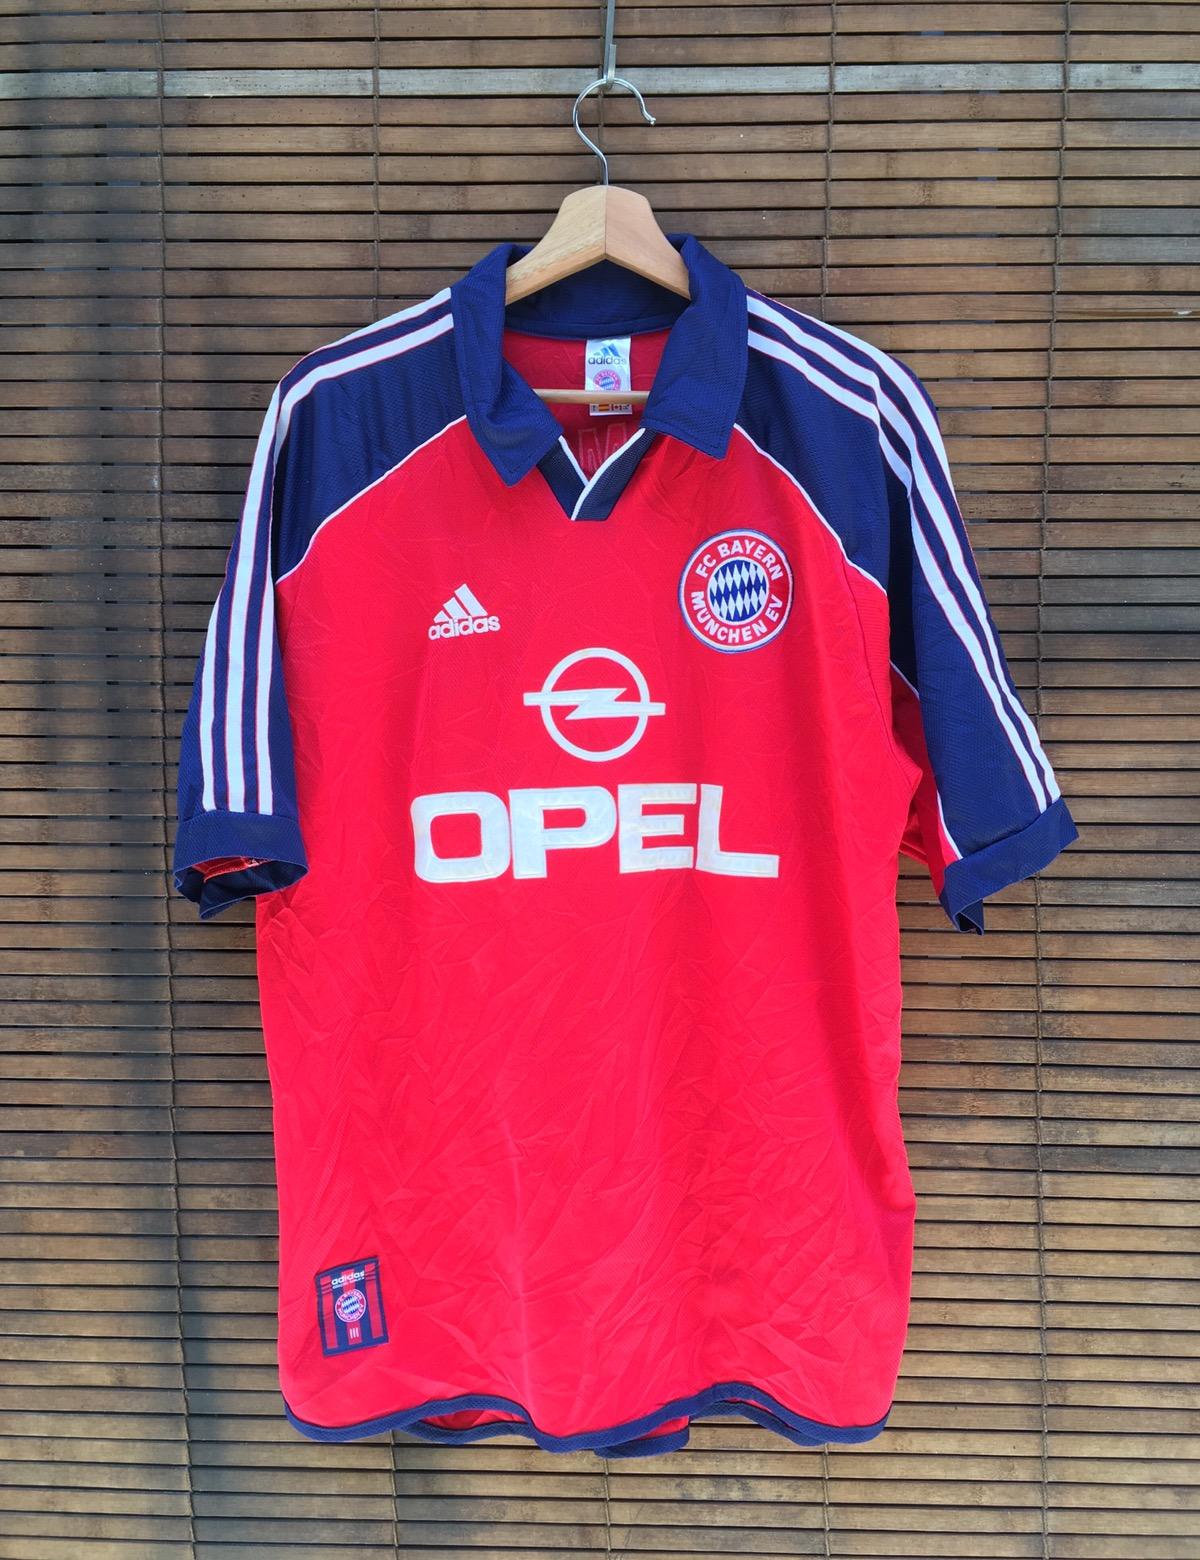 timeless design 80e82 3b4f7 Adidas Bayern Munich Football Club 22 Tops Jersey